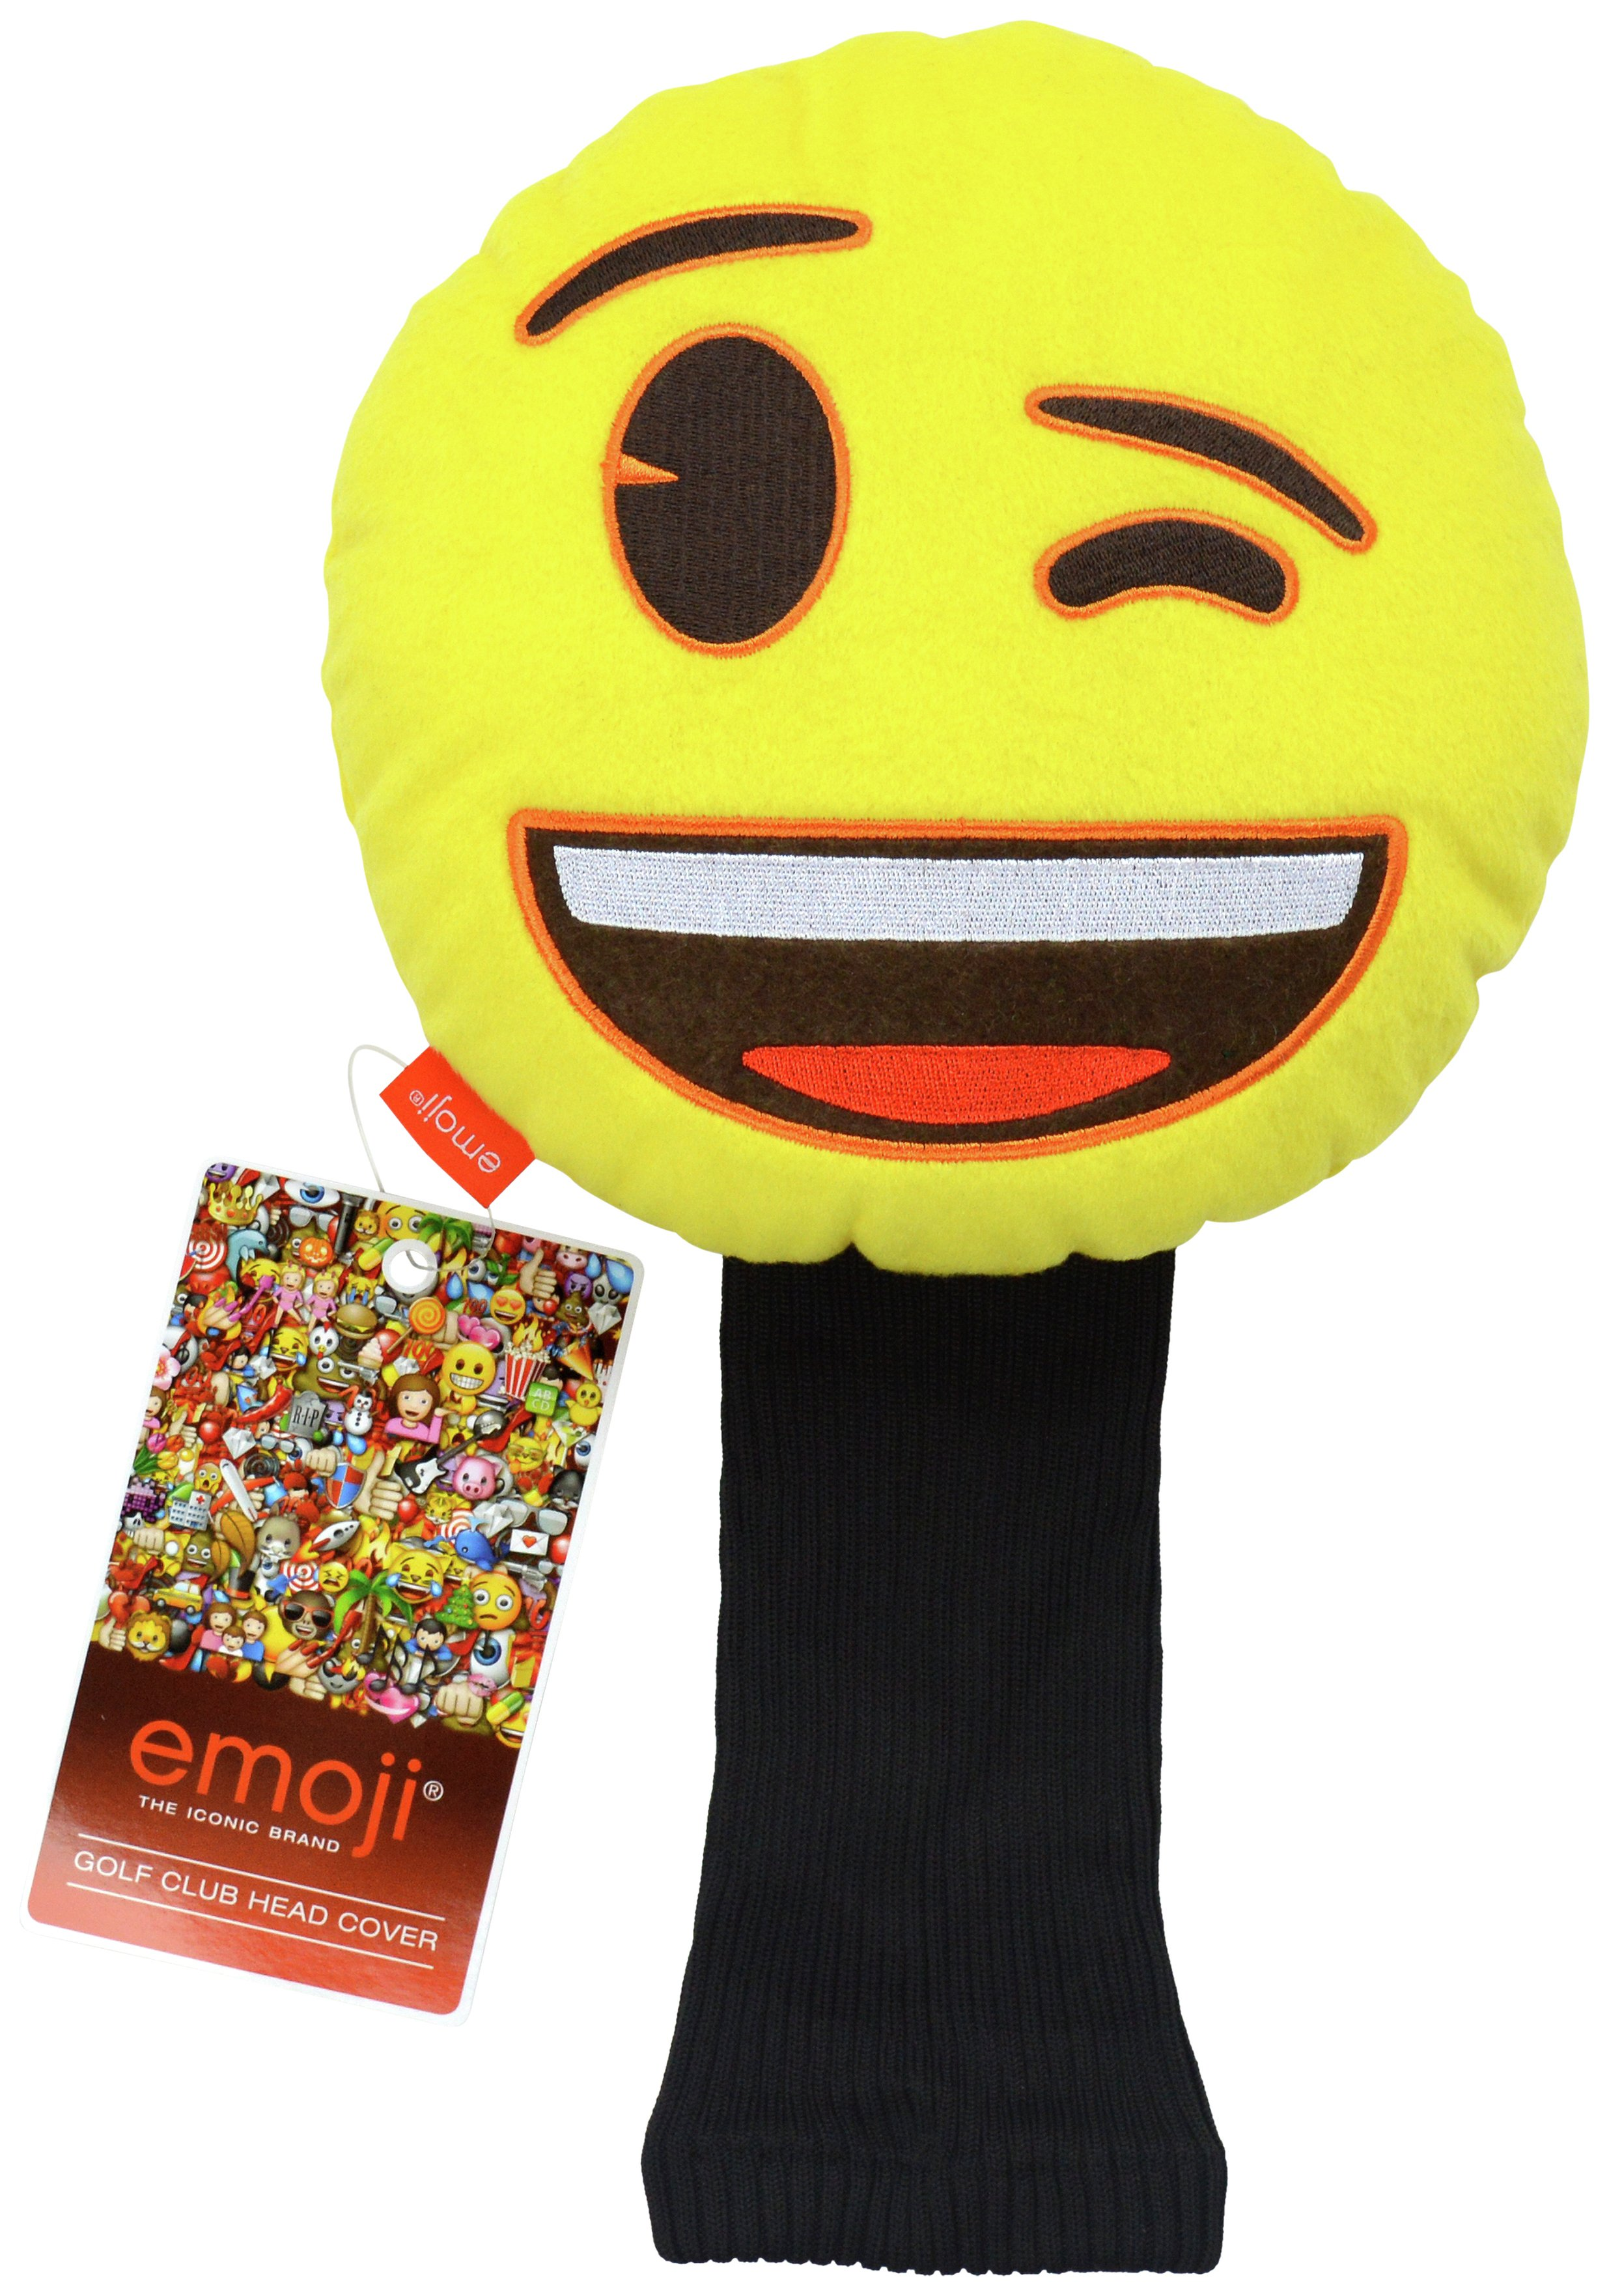 Image of Emoji Golf Headcover - Wink